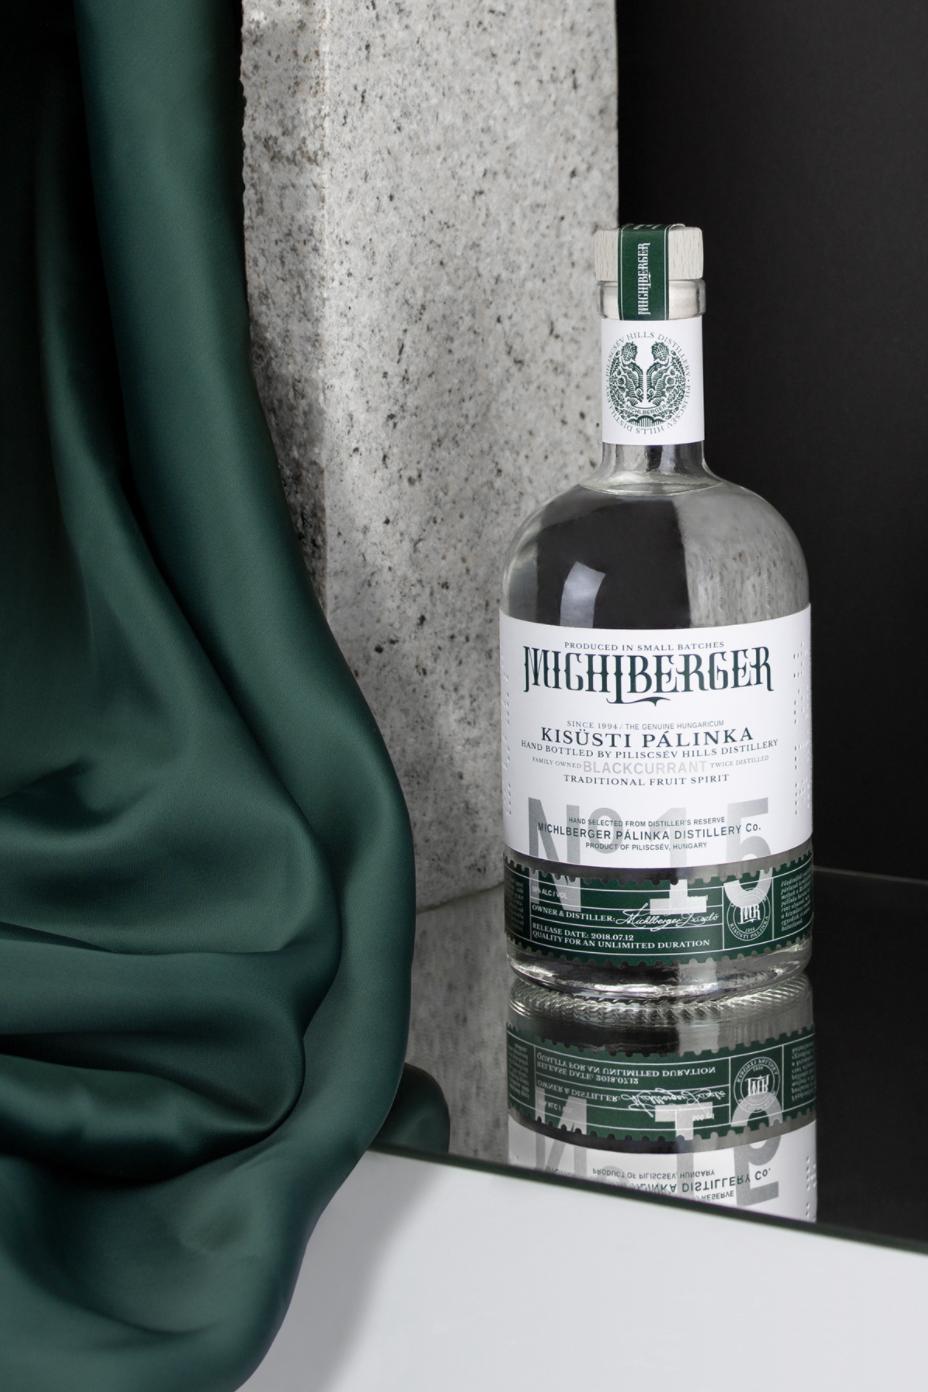 Michlberger Pálinka Rebranding by Kristof Balla Celebrates Hungarian Tradition